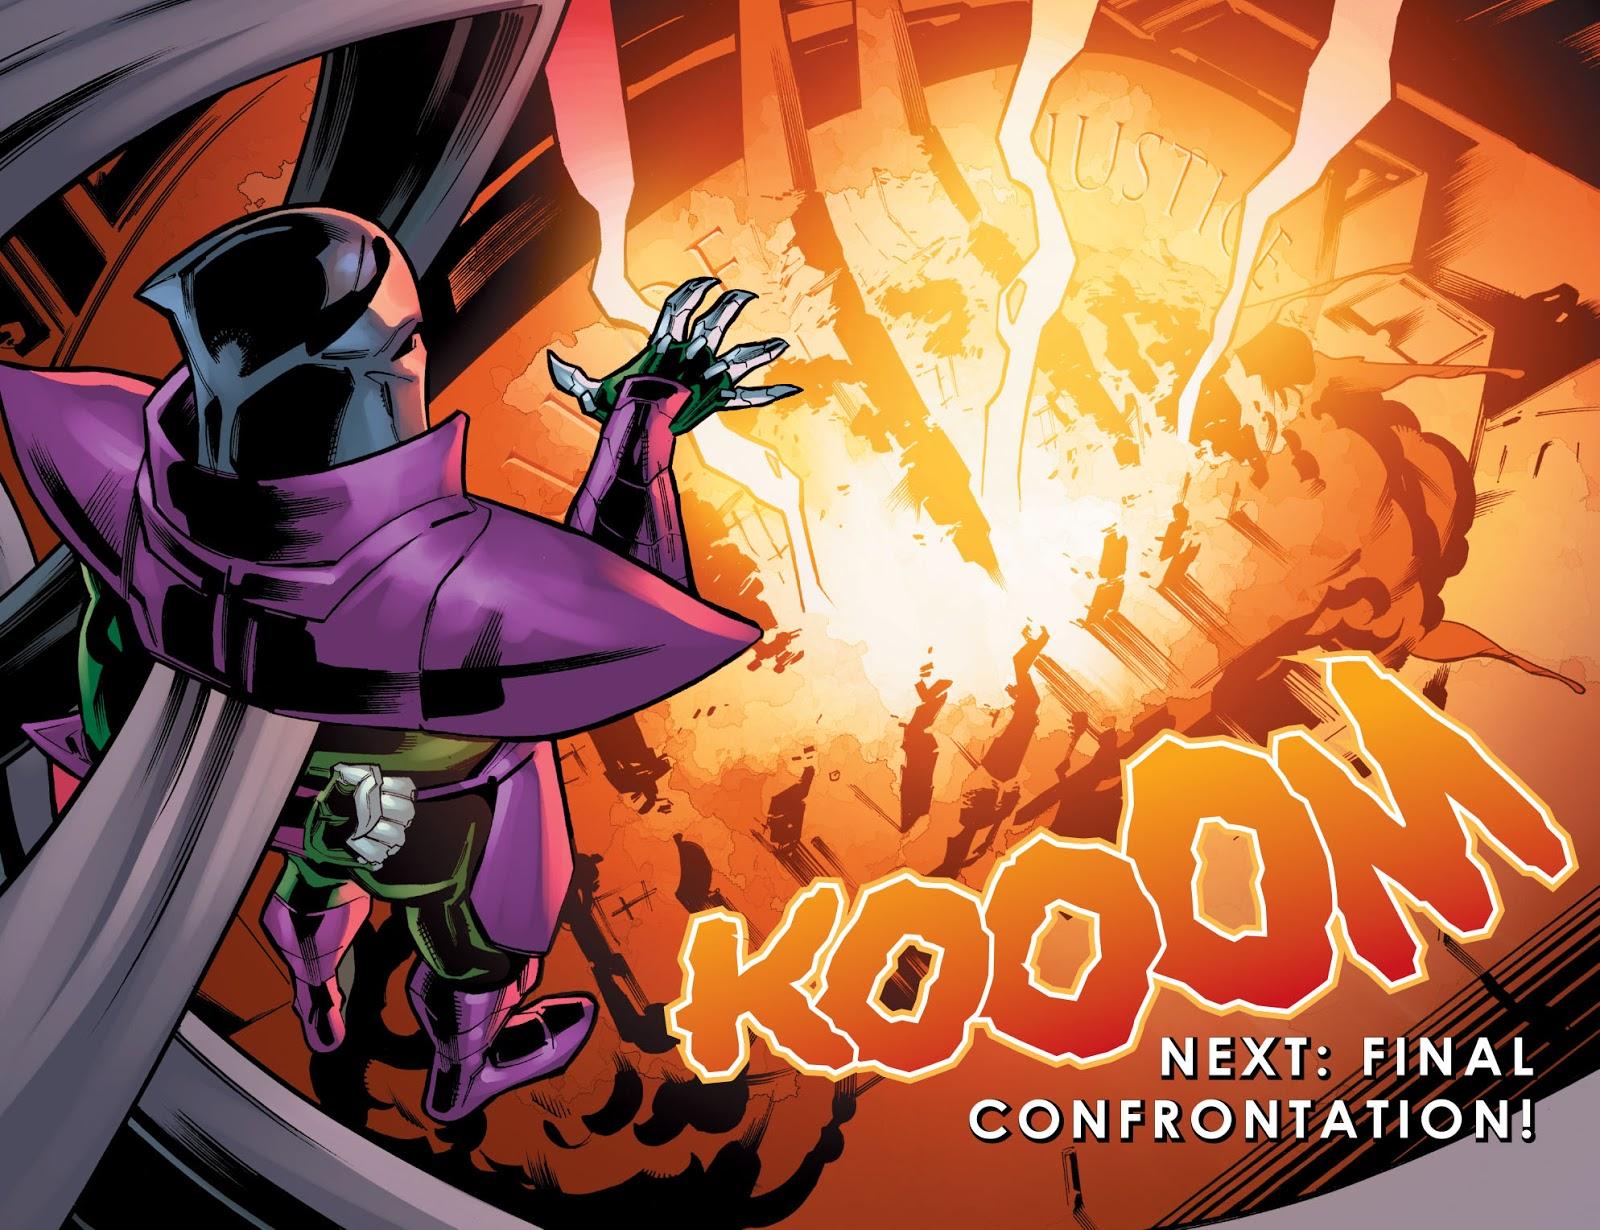 The Joker Gains Super Powers (Injustice Gods Among Us)